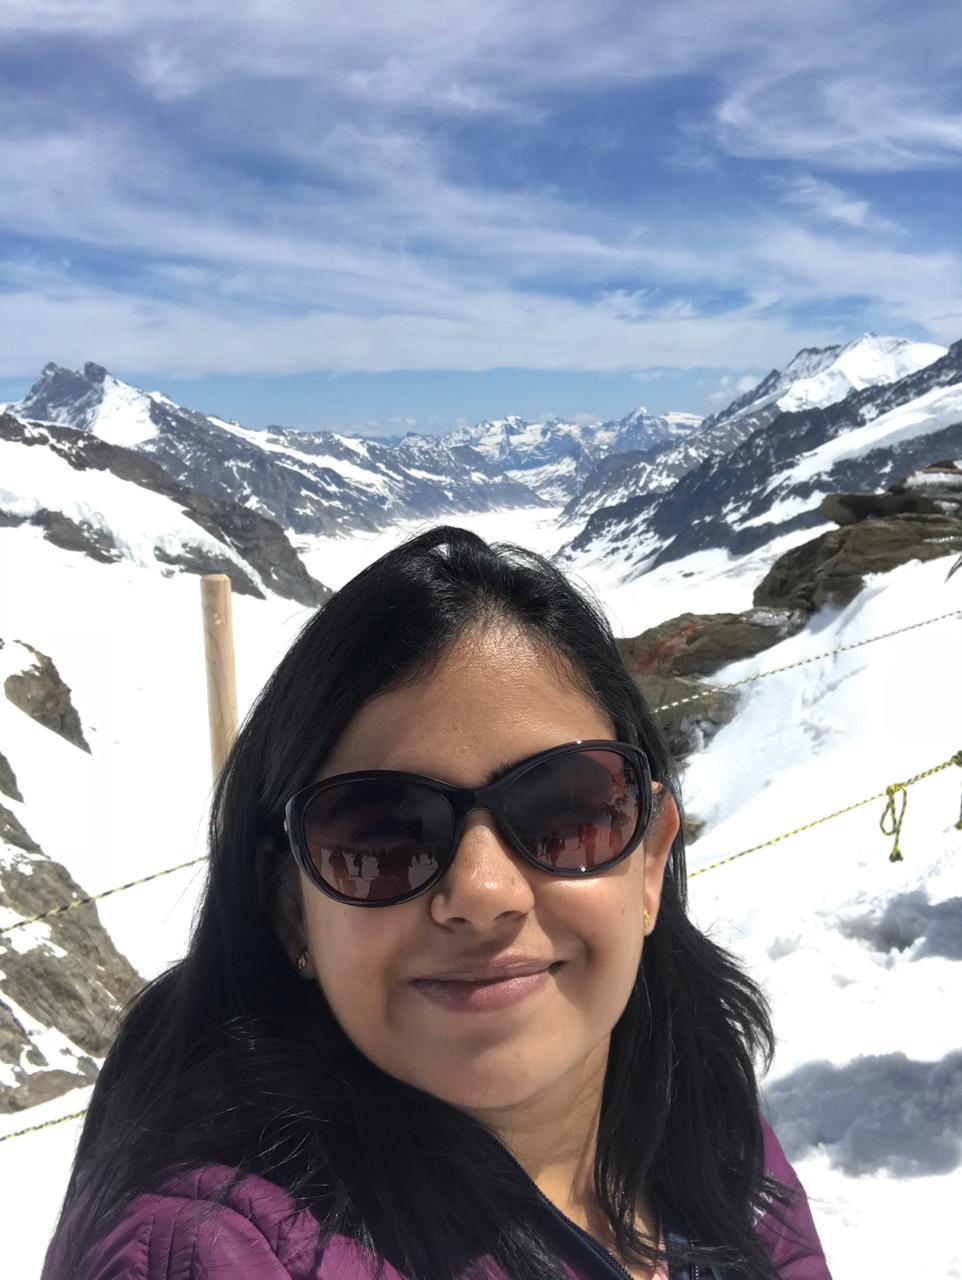 Photo of Jungfraujoch By Anuja Bhatnagar